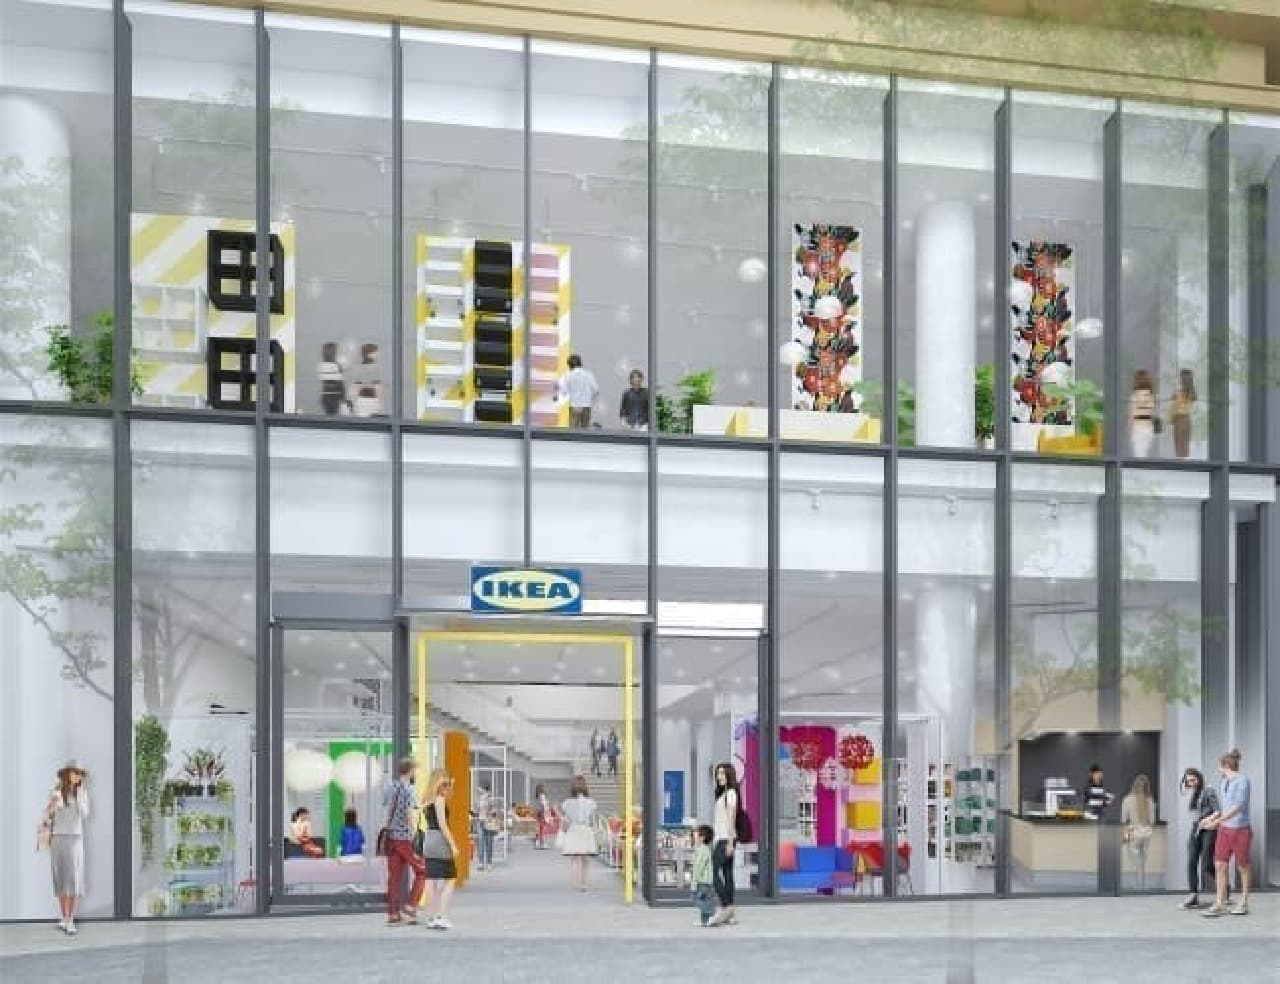 「IKEA原宿」が6月8日開業 -- 初の都市型店舗、手軽に楽しめるカフェも